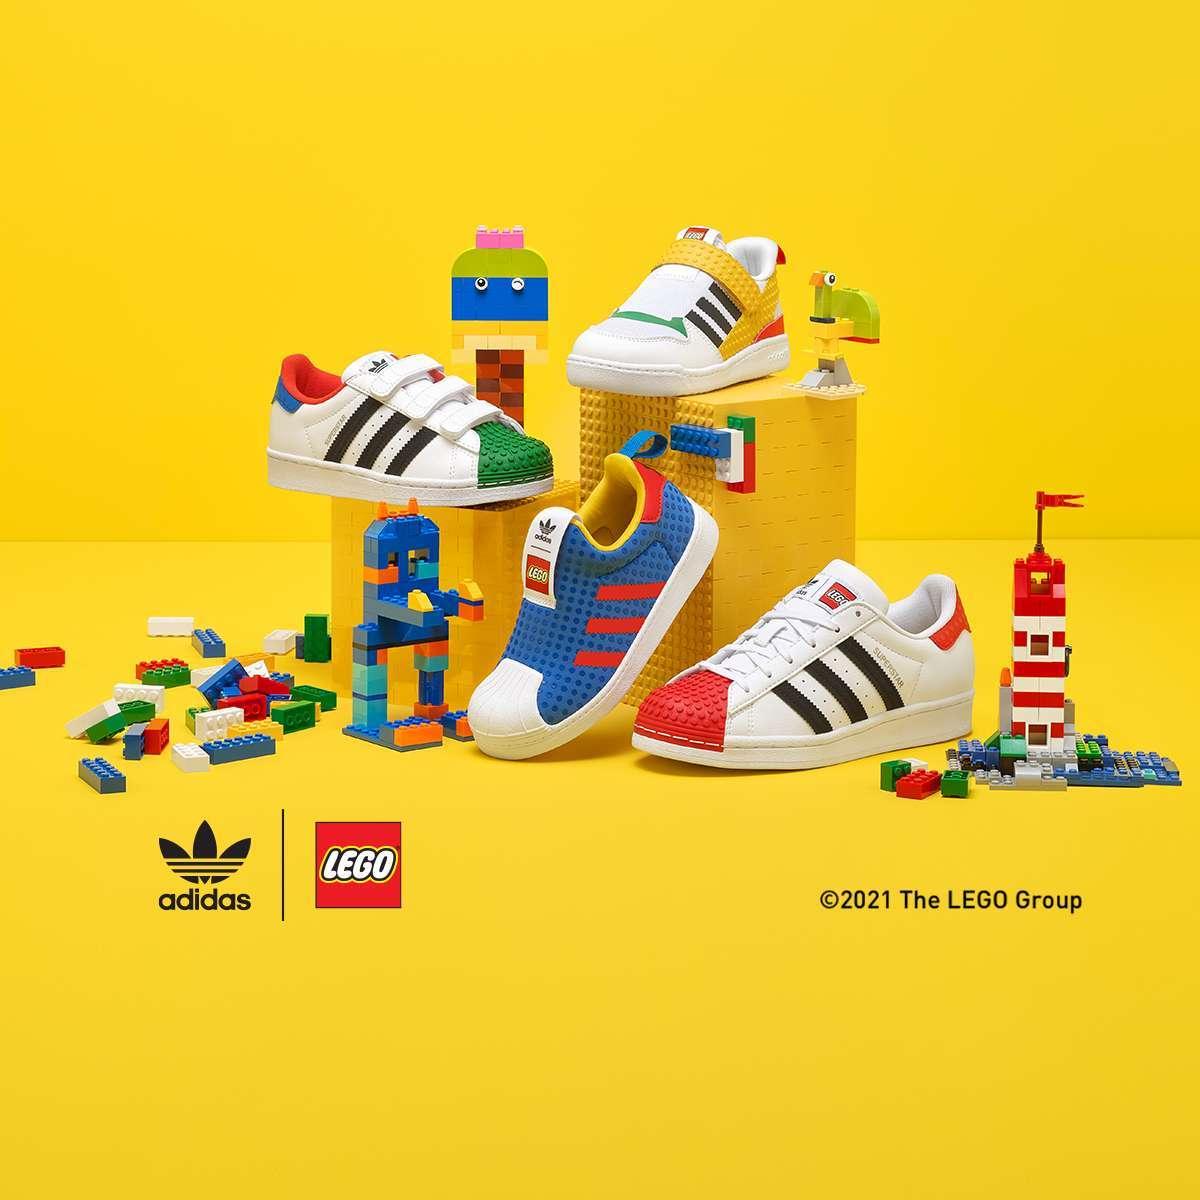 originals-ss21-lego-kids-app-drop-collection-detail-page